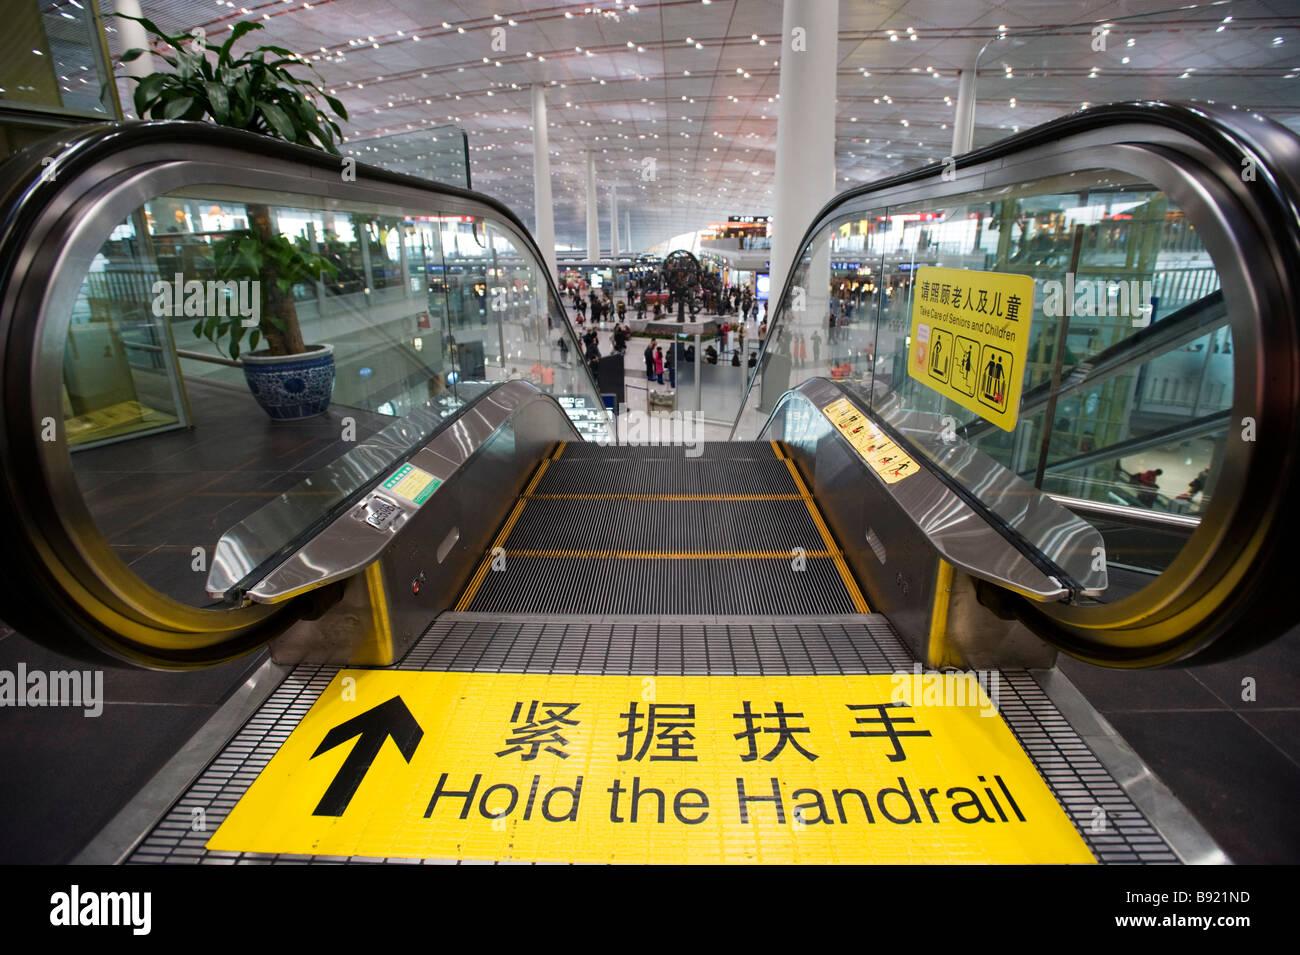 Detail of escalator at new Terminal 3 at Beijing Airport China - Stock Image